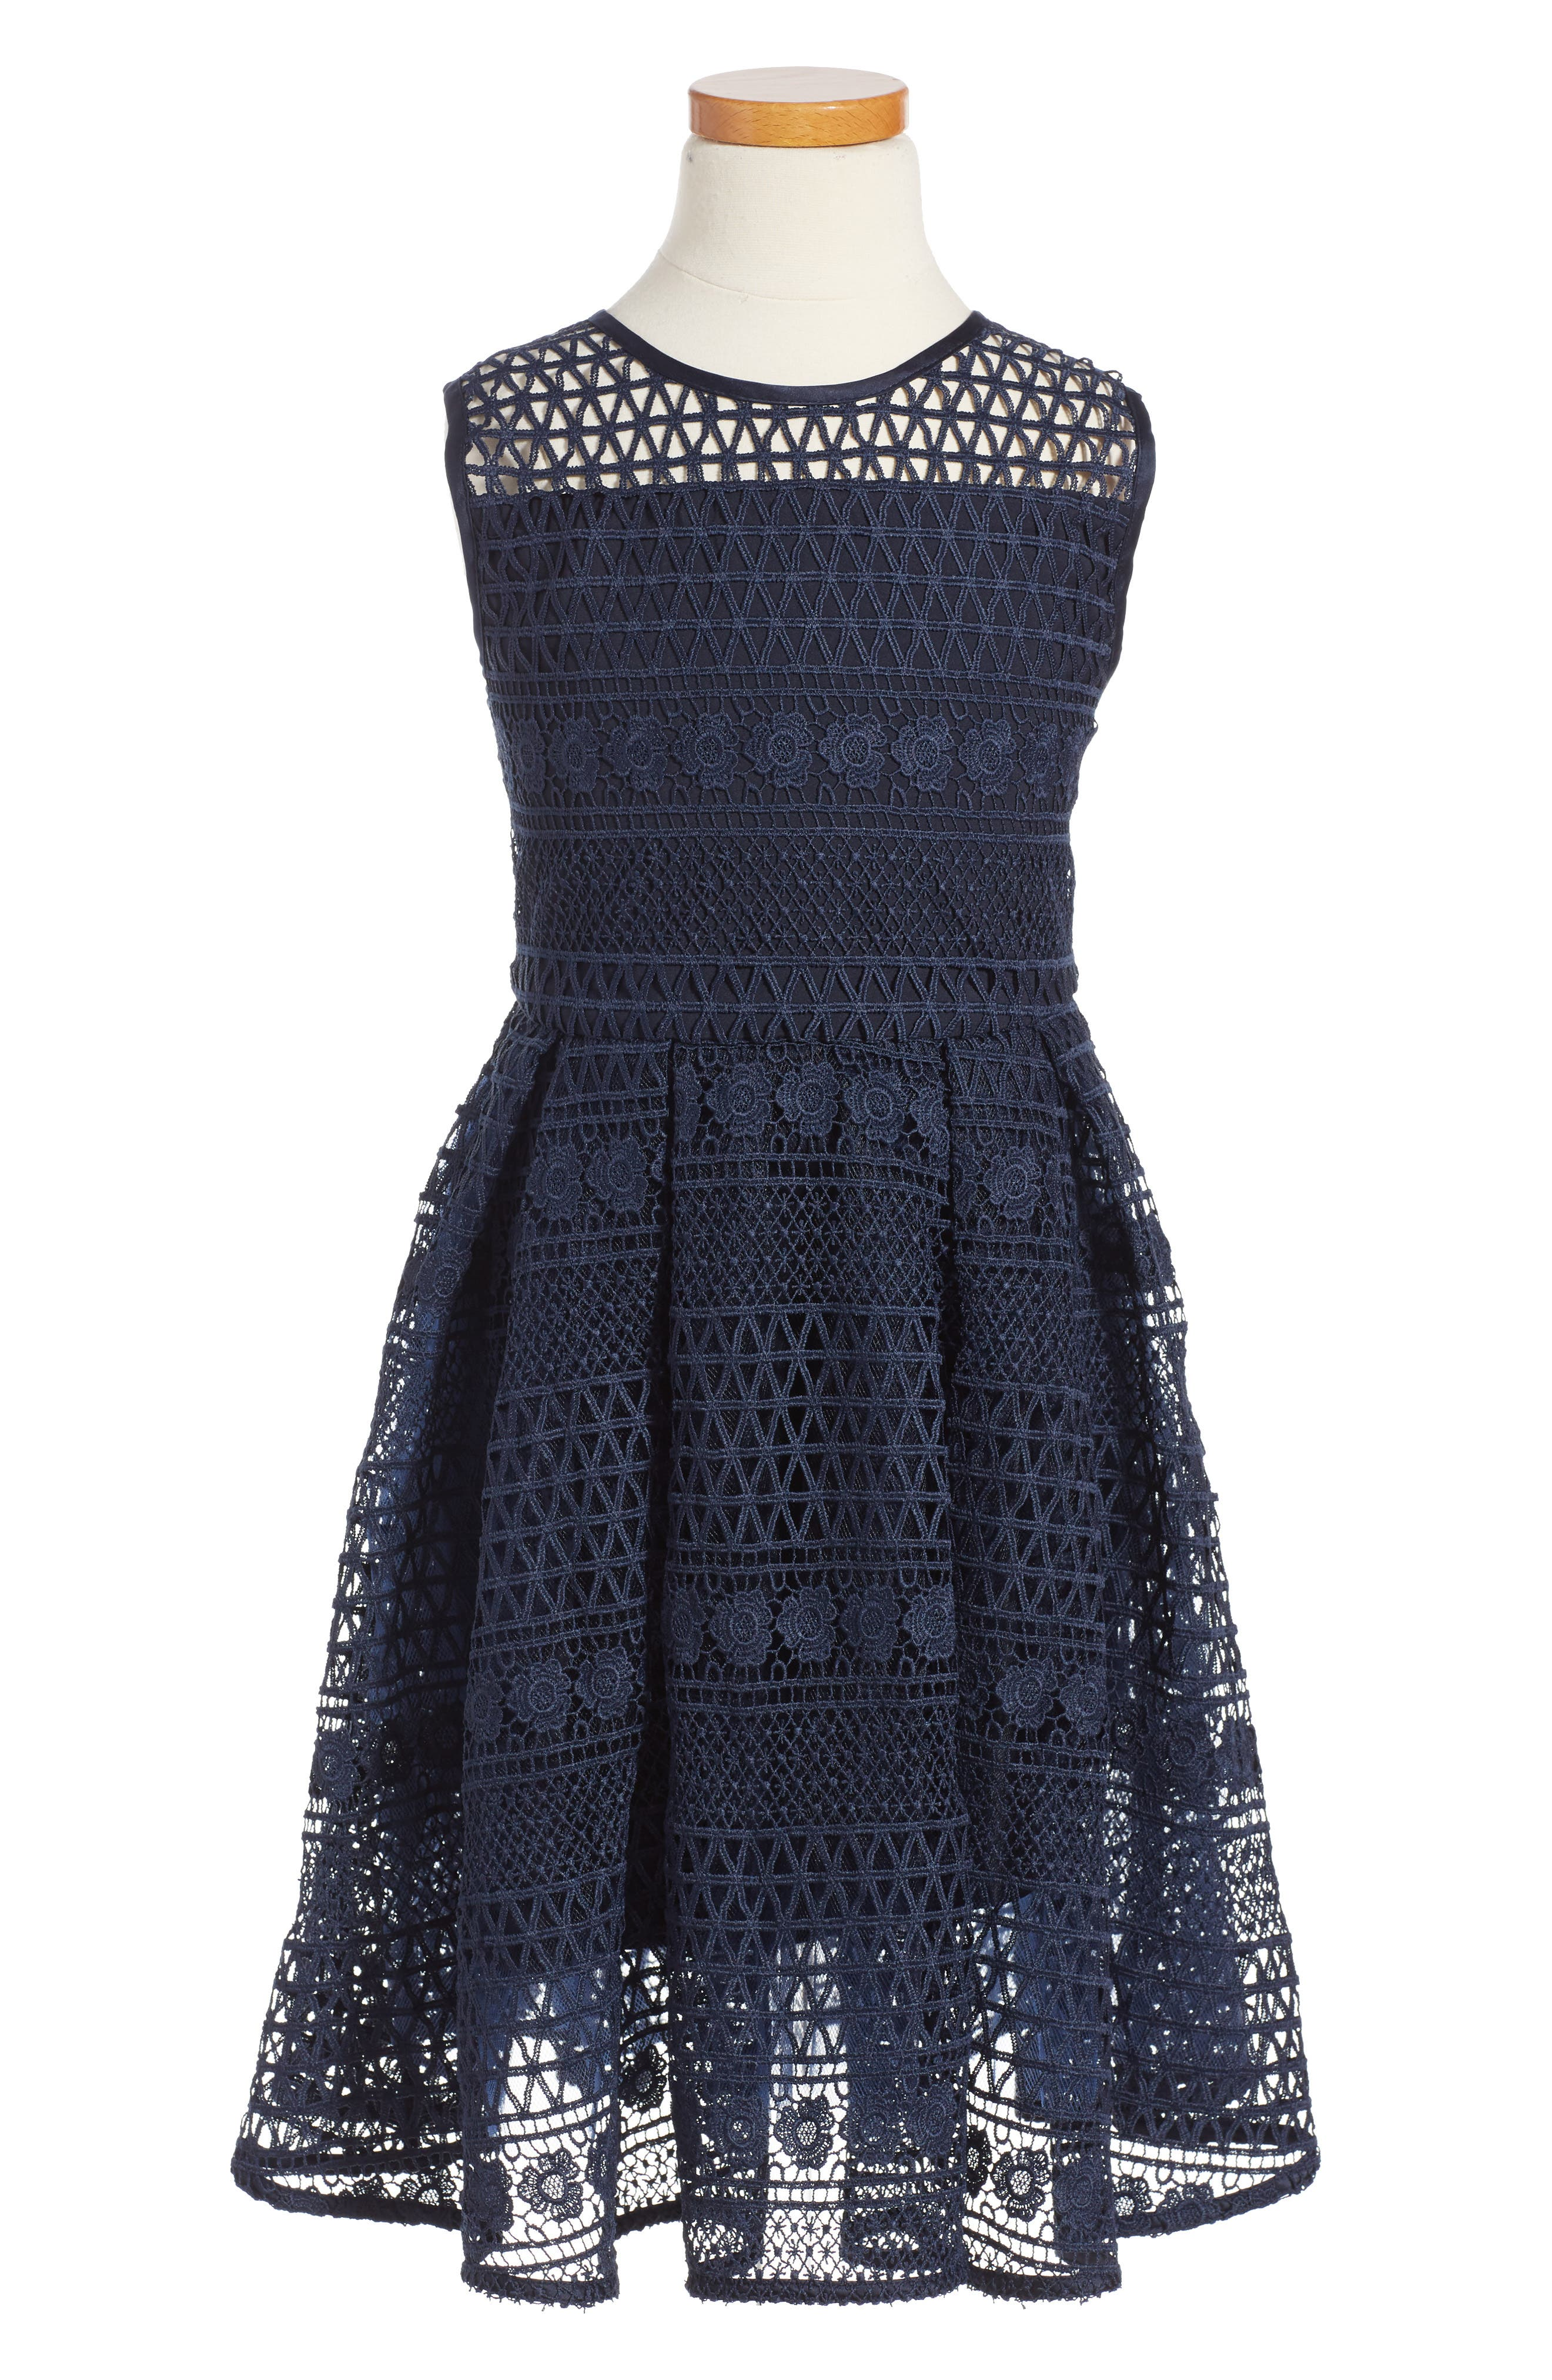 Main Image - Bardot Junior Linear Lace Dress (Big Girls)